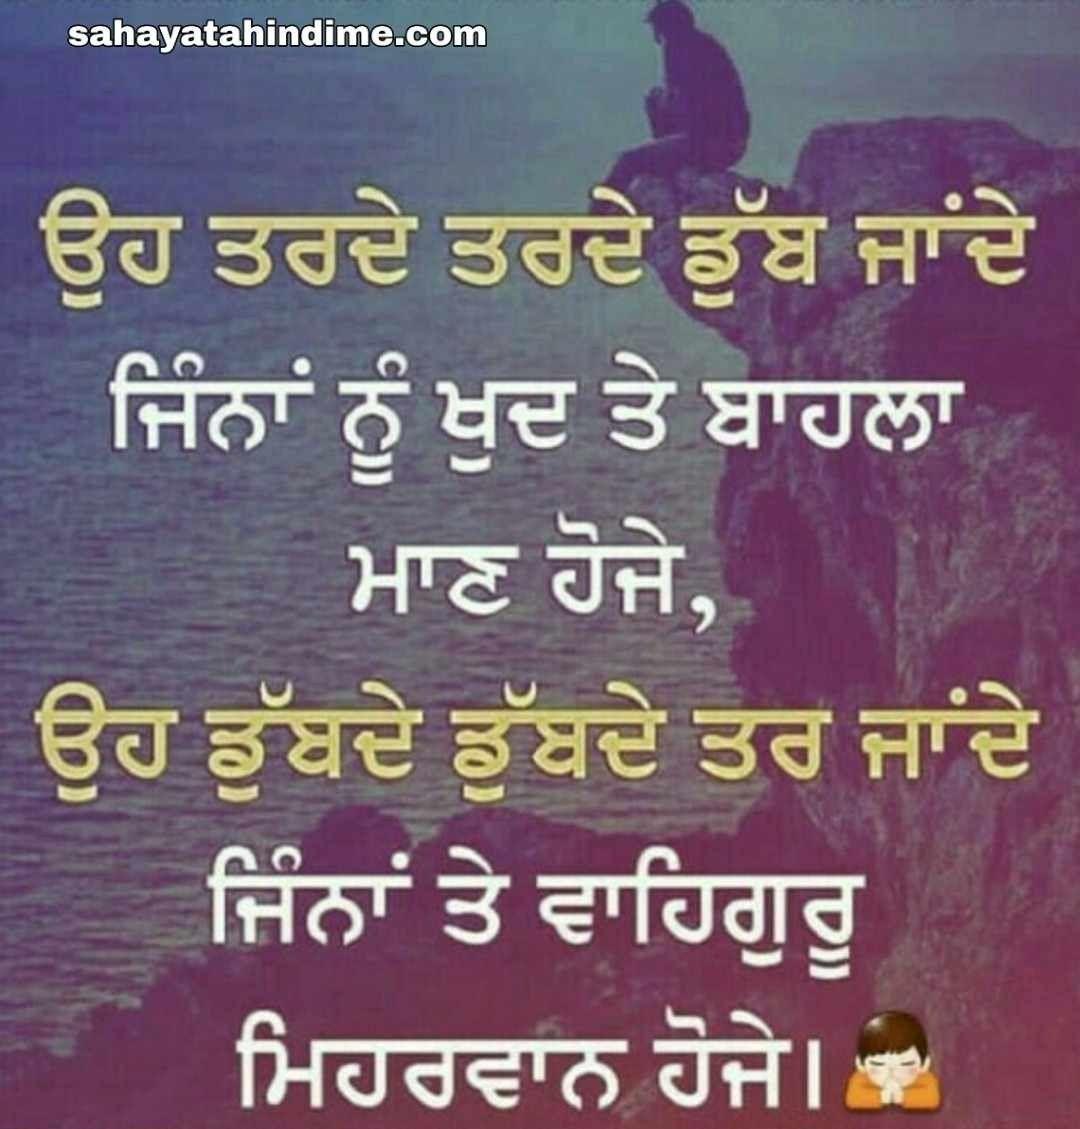 Punjabi Status Inspirational Quotes Pictures Gurbani Quotes Good Thoughts Quotes